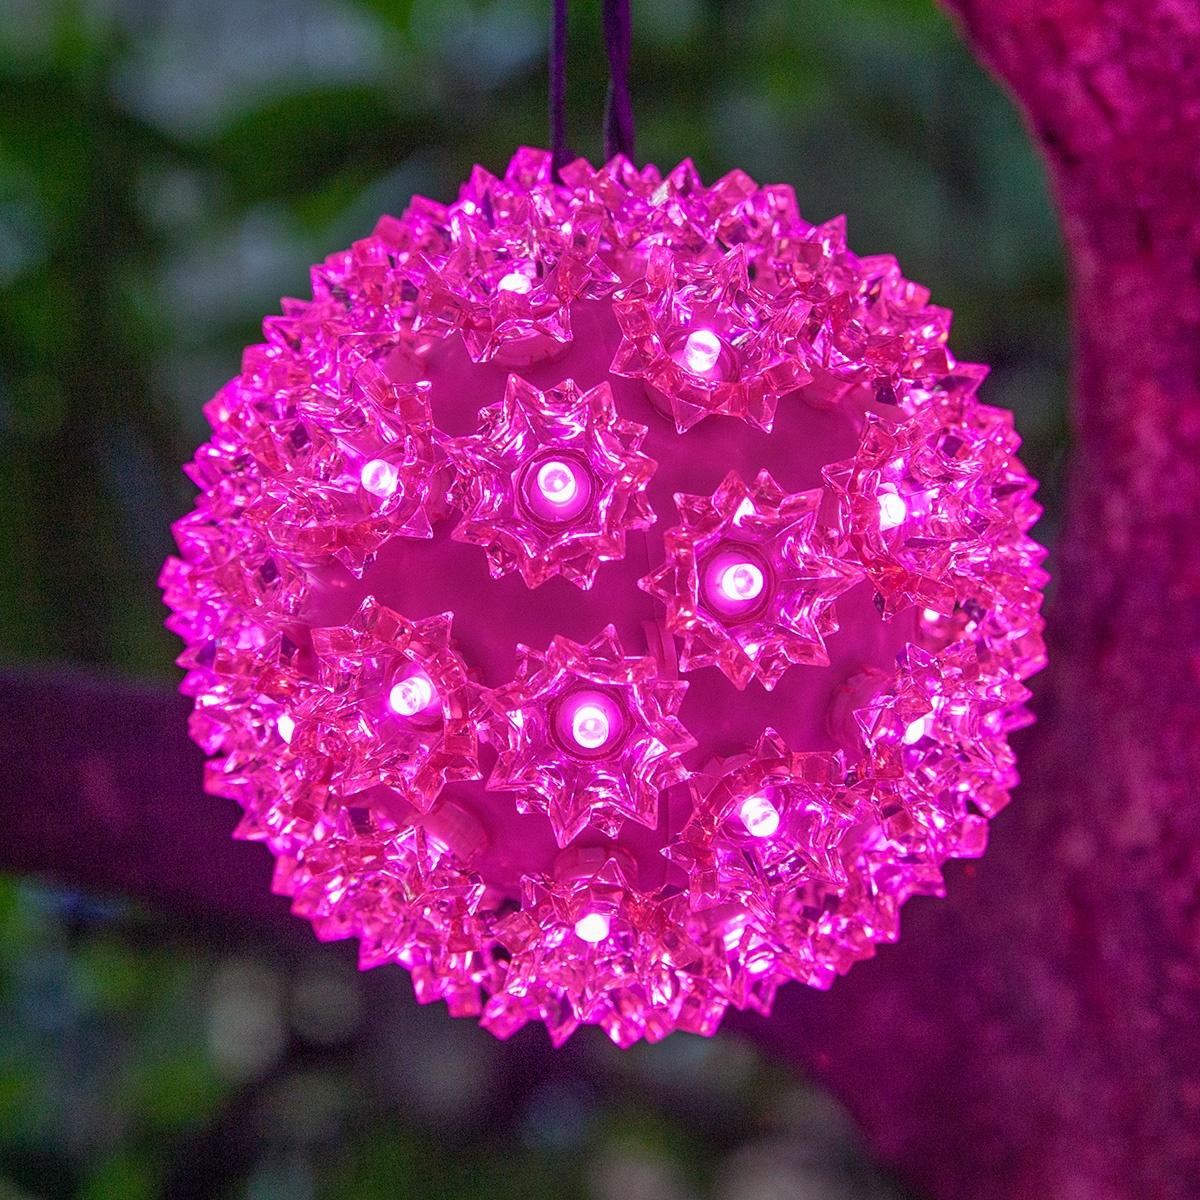 Starlight Sphere Christmas Lights